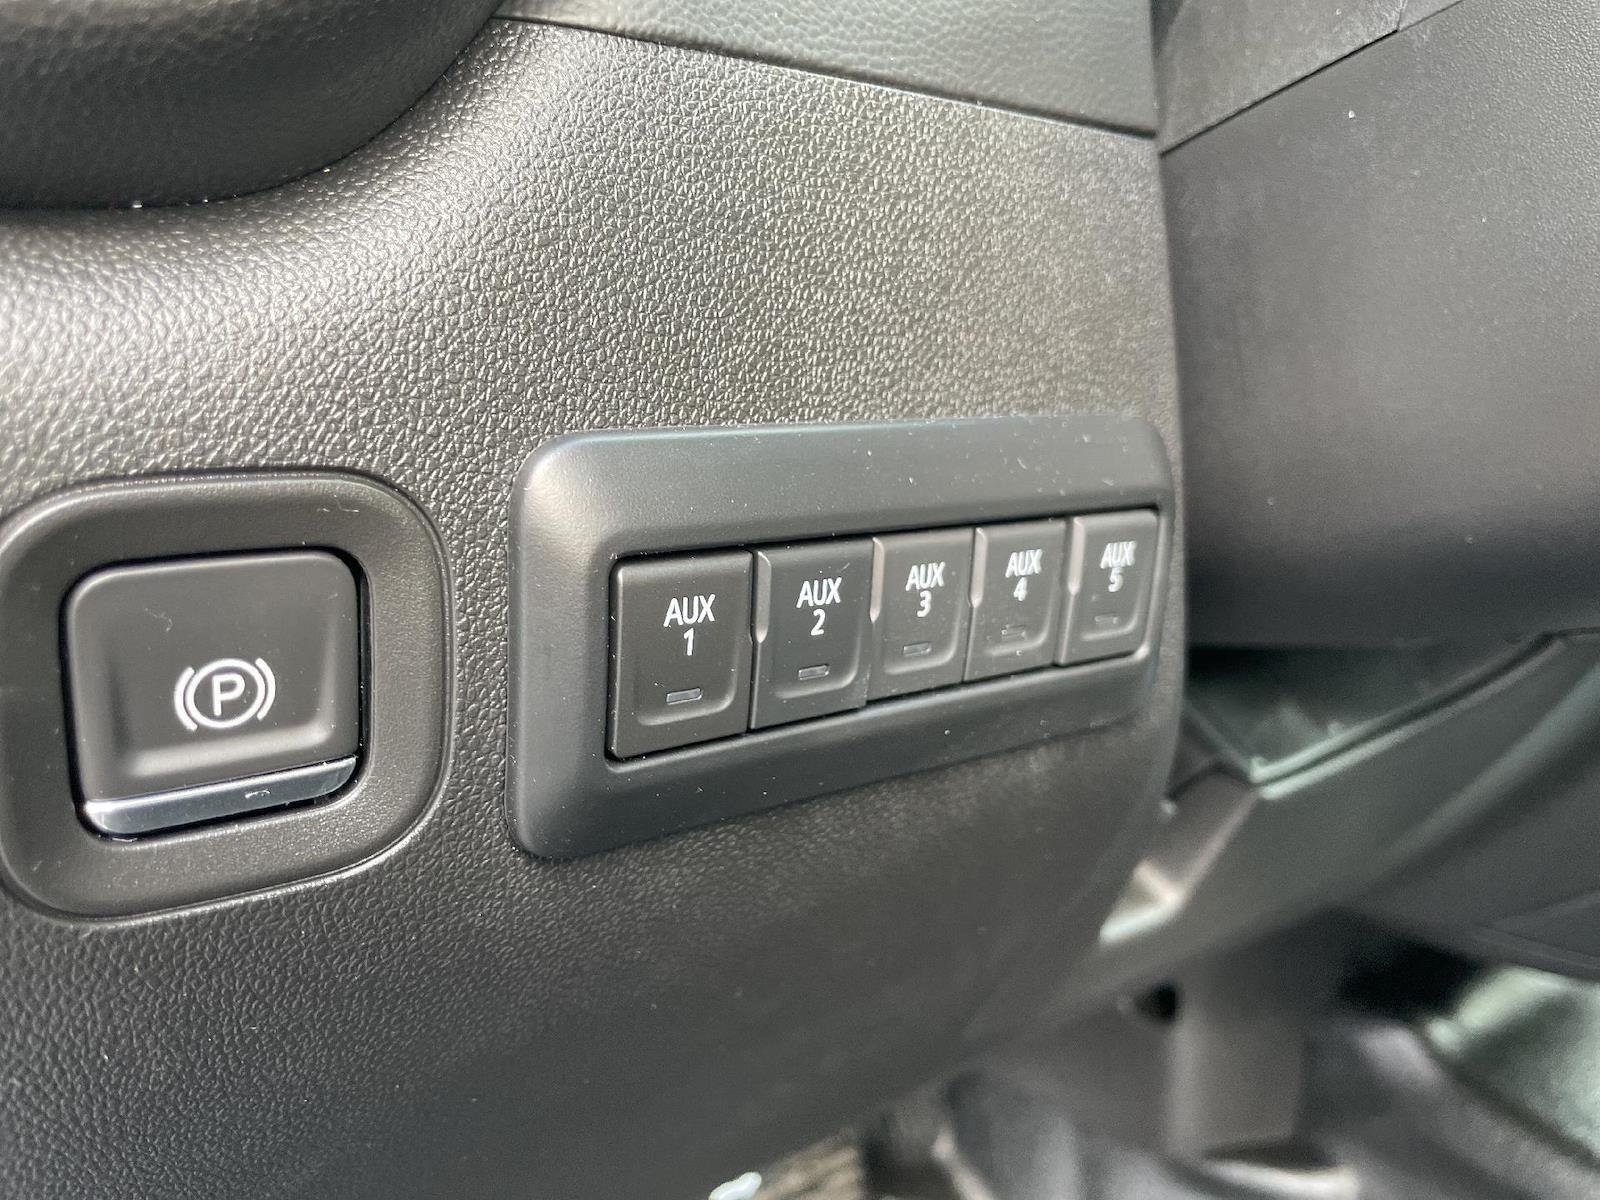 2021 Chevrolet Silverado 3500 Regular Cab AWD, Knapheide PGND Gooseneck Hauler Body #143979 - photo 12